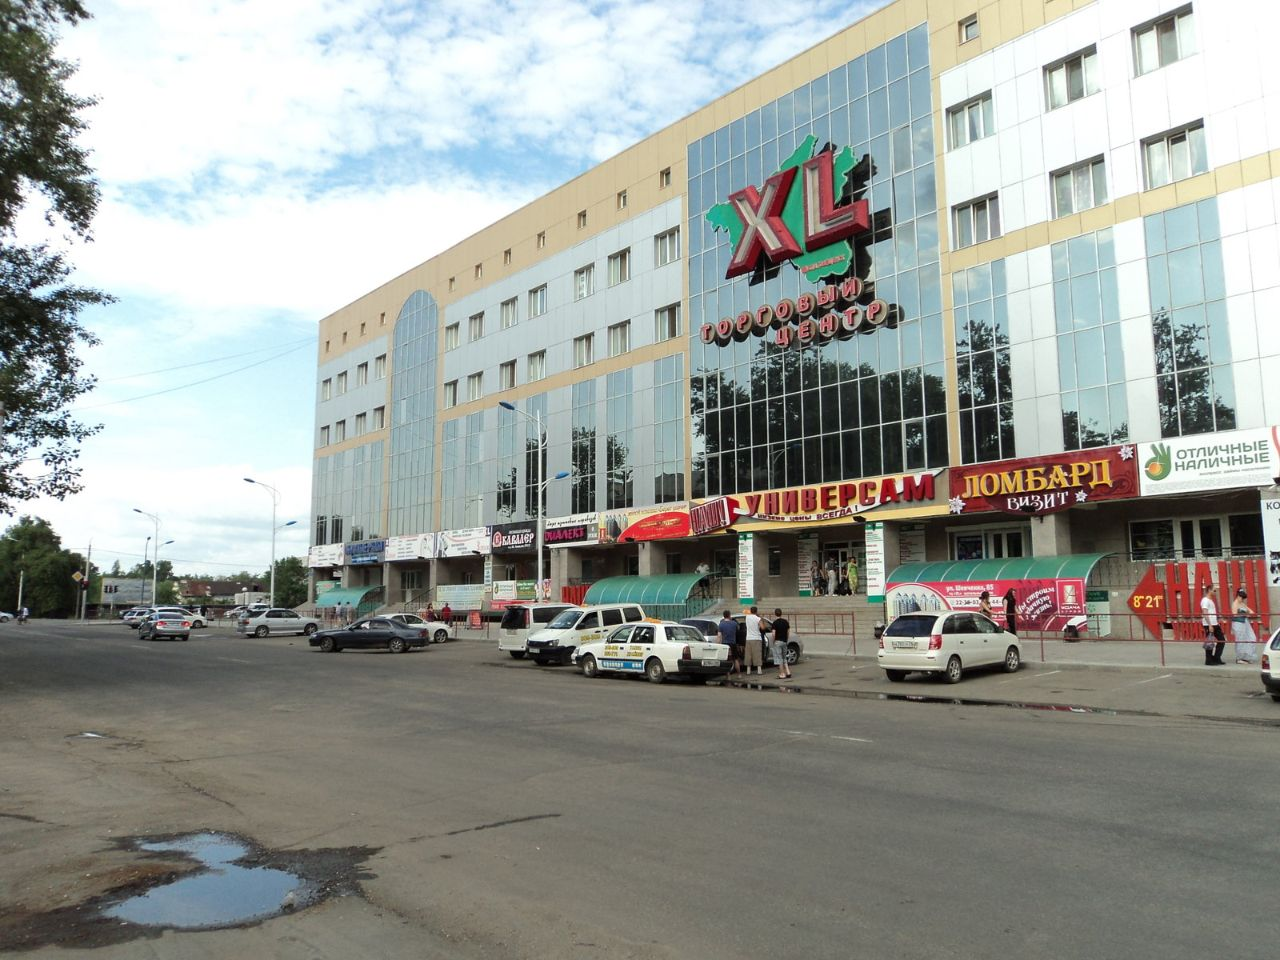 аренда помещений в ТЦ XL (ИксЭль)